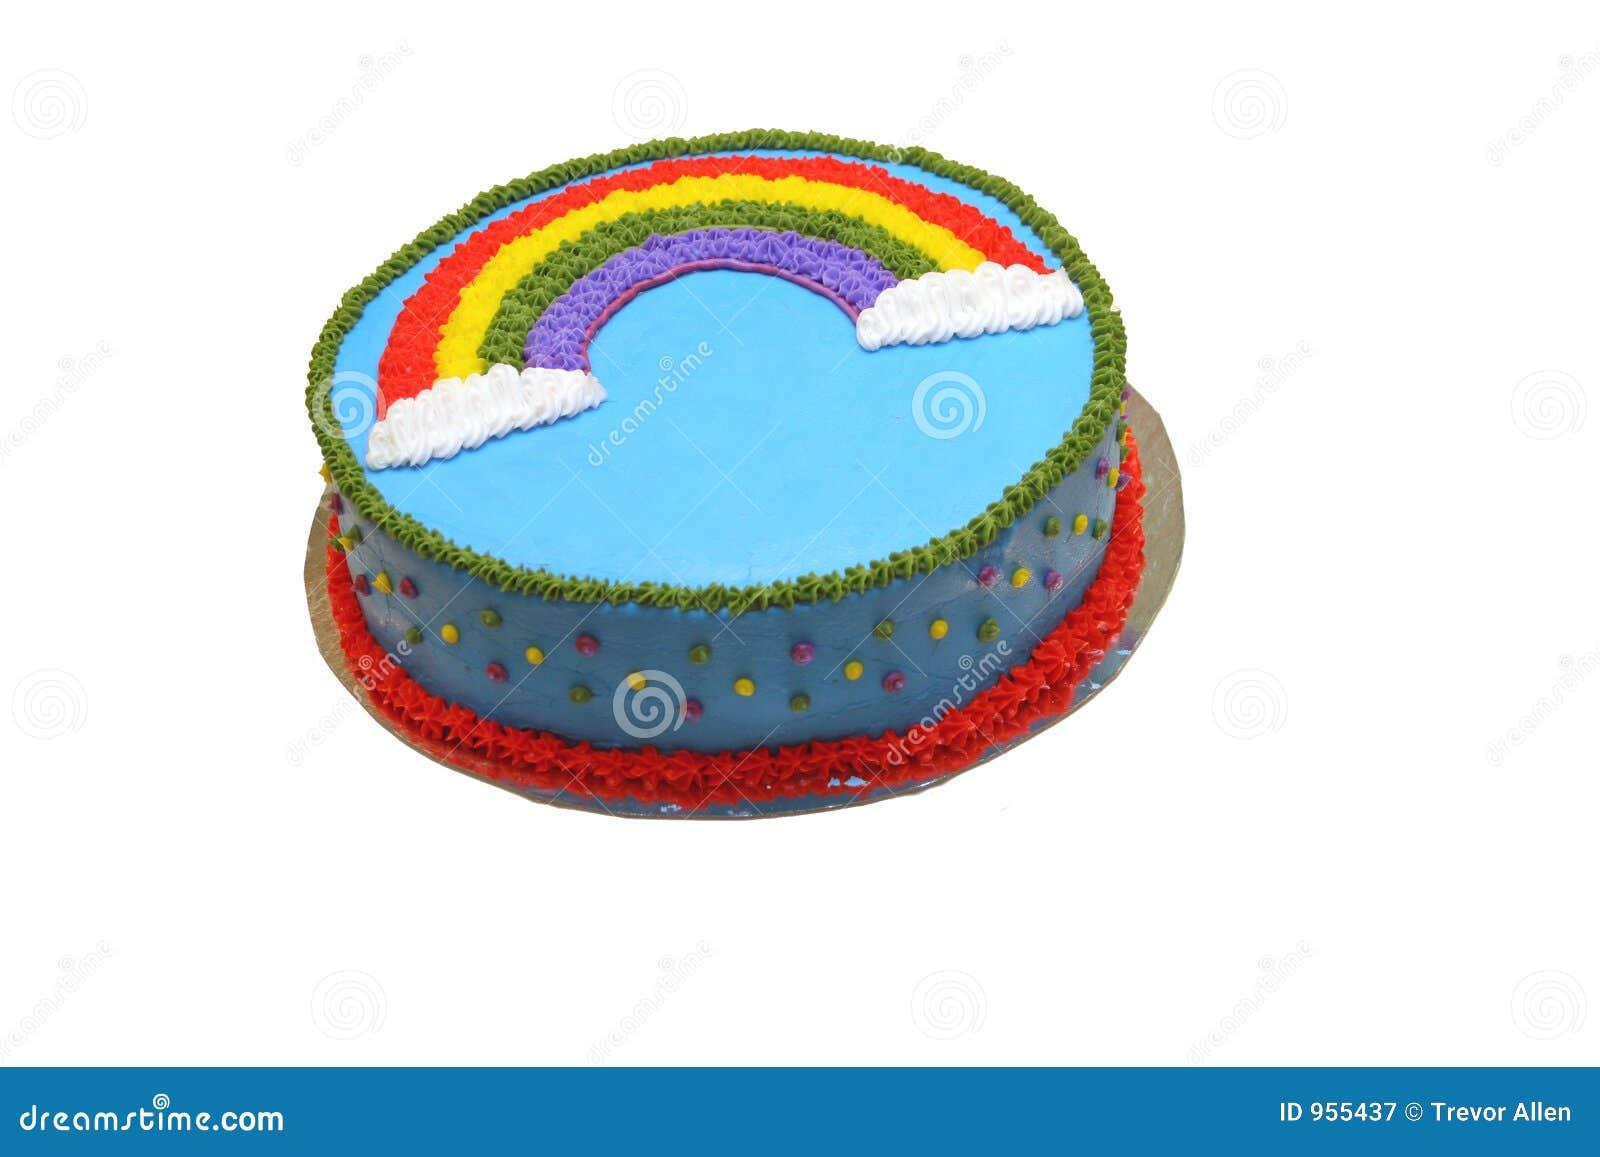 Congratulations Horse Cake Images